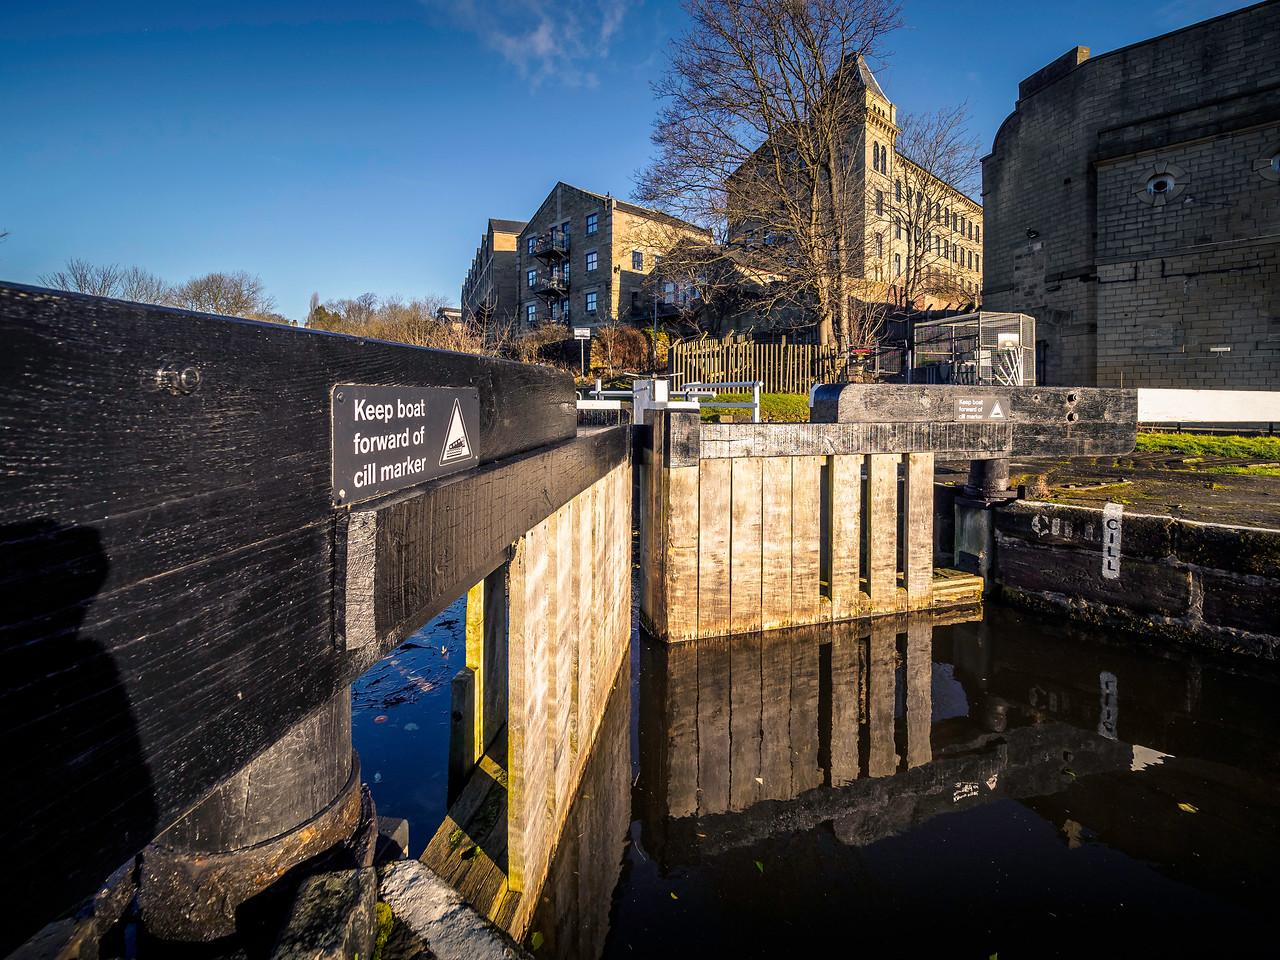 Dowley Gap Locks, Bingley